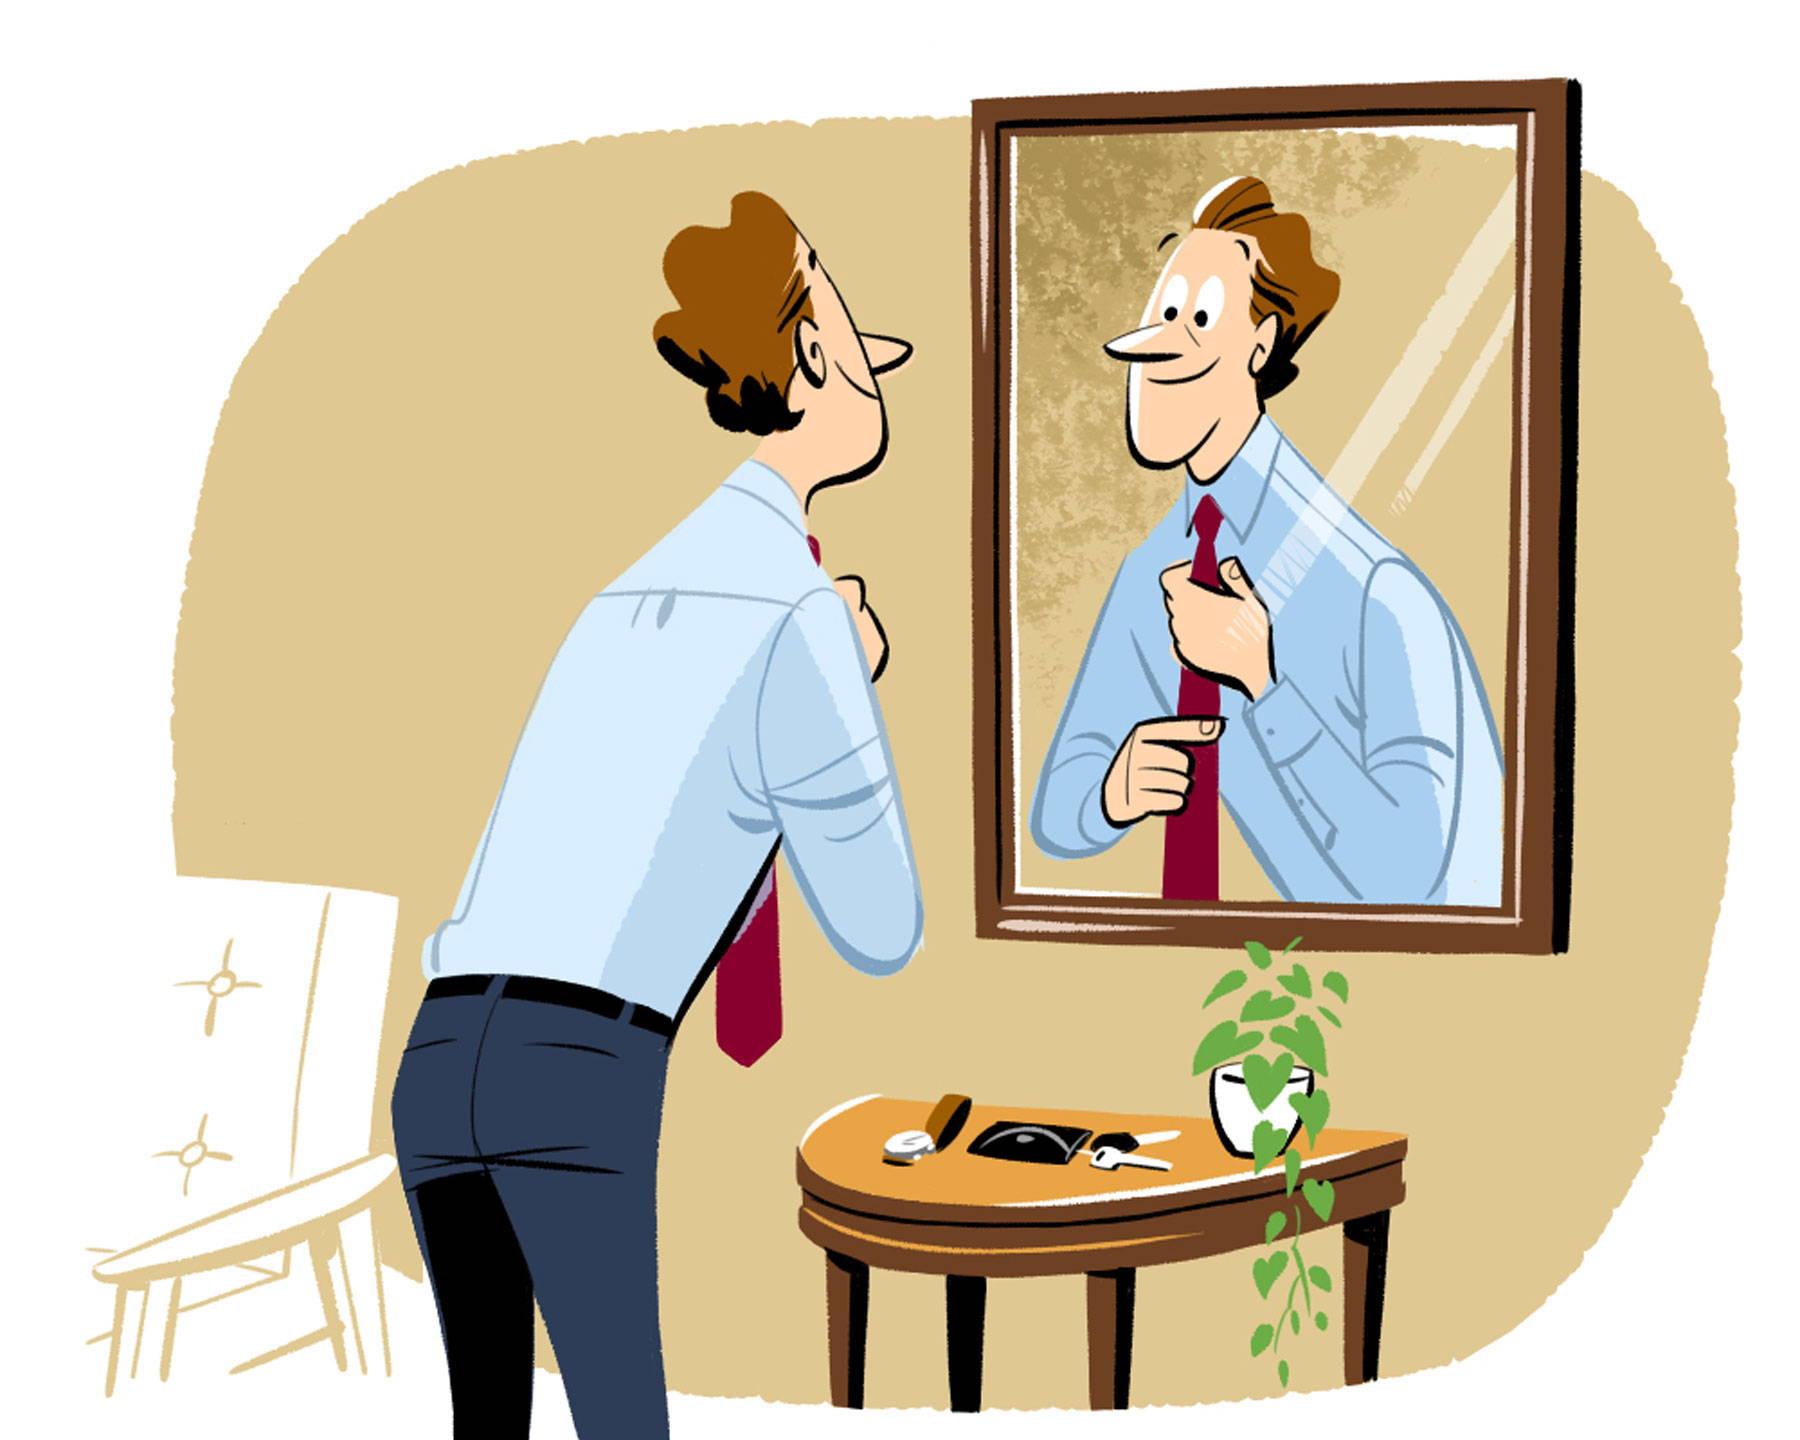 Illustration man tying tie in mirror